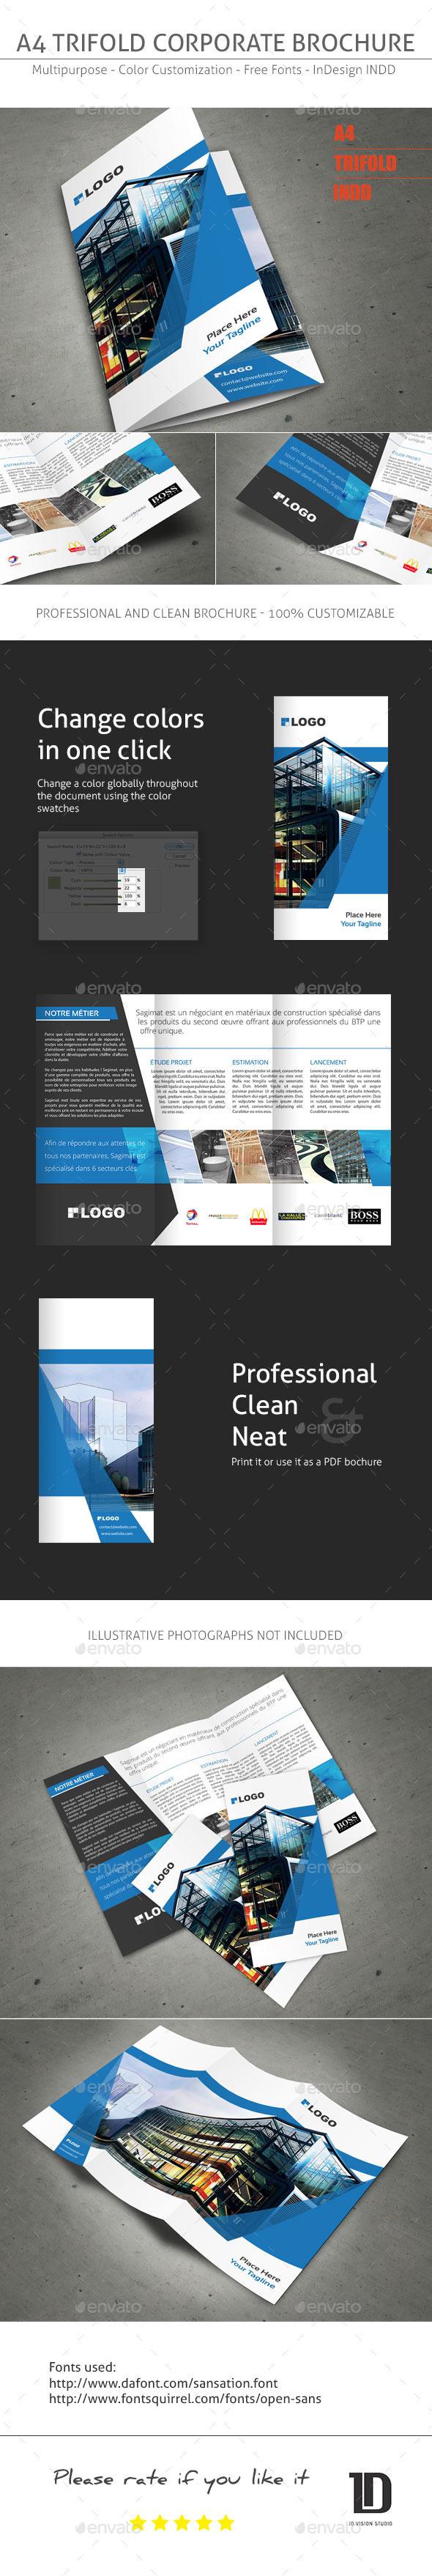 a4 tri fold brochure template .